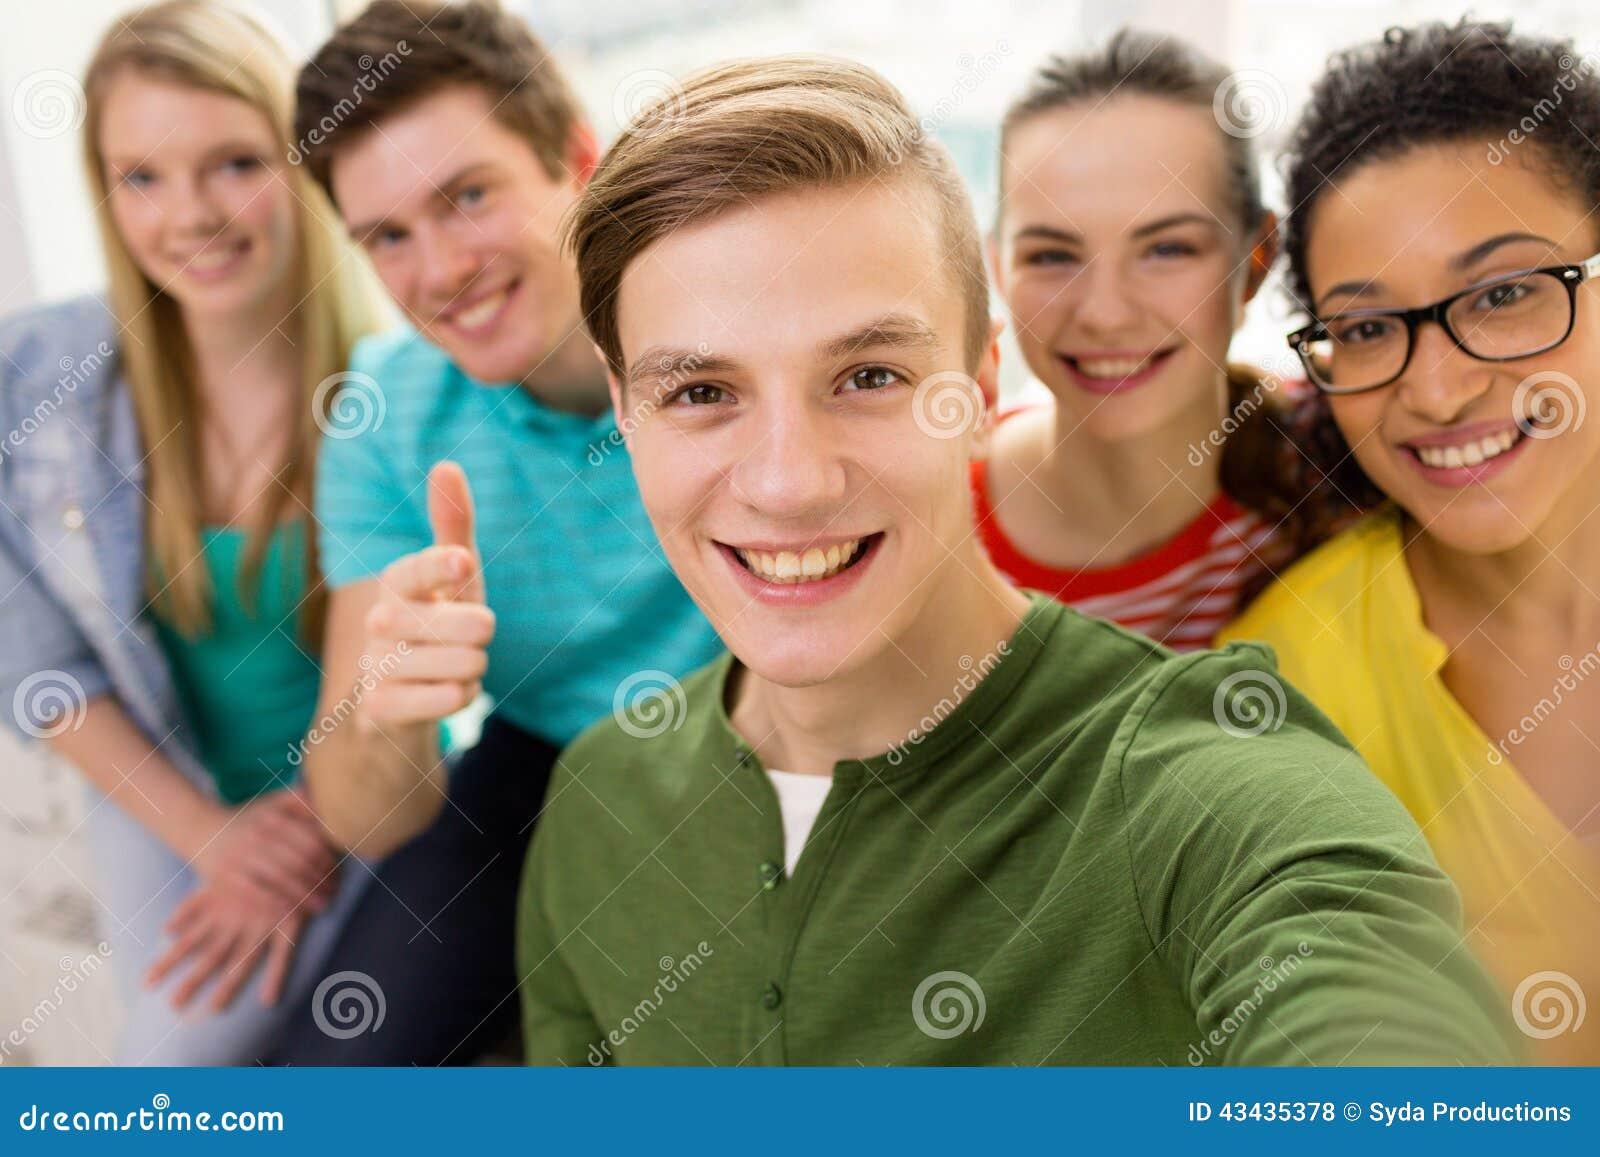 Five smiling students taking selfie at school